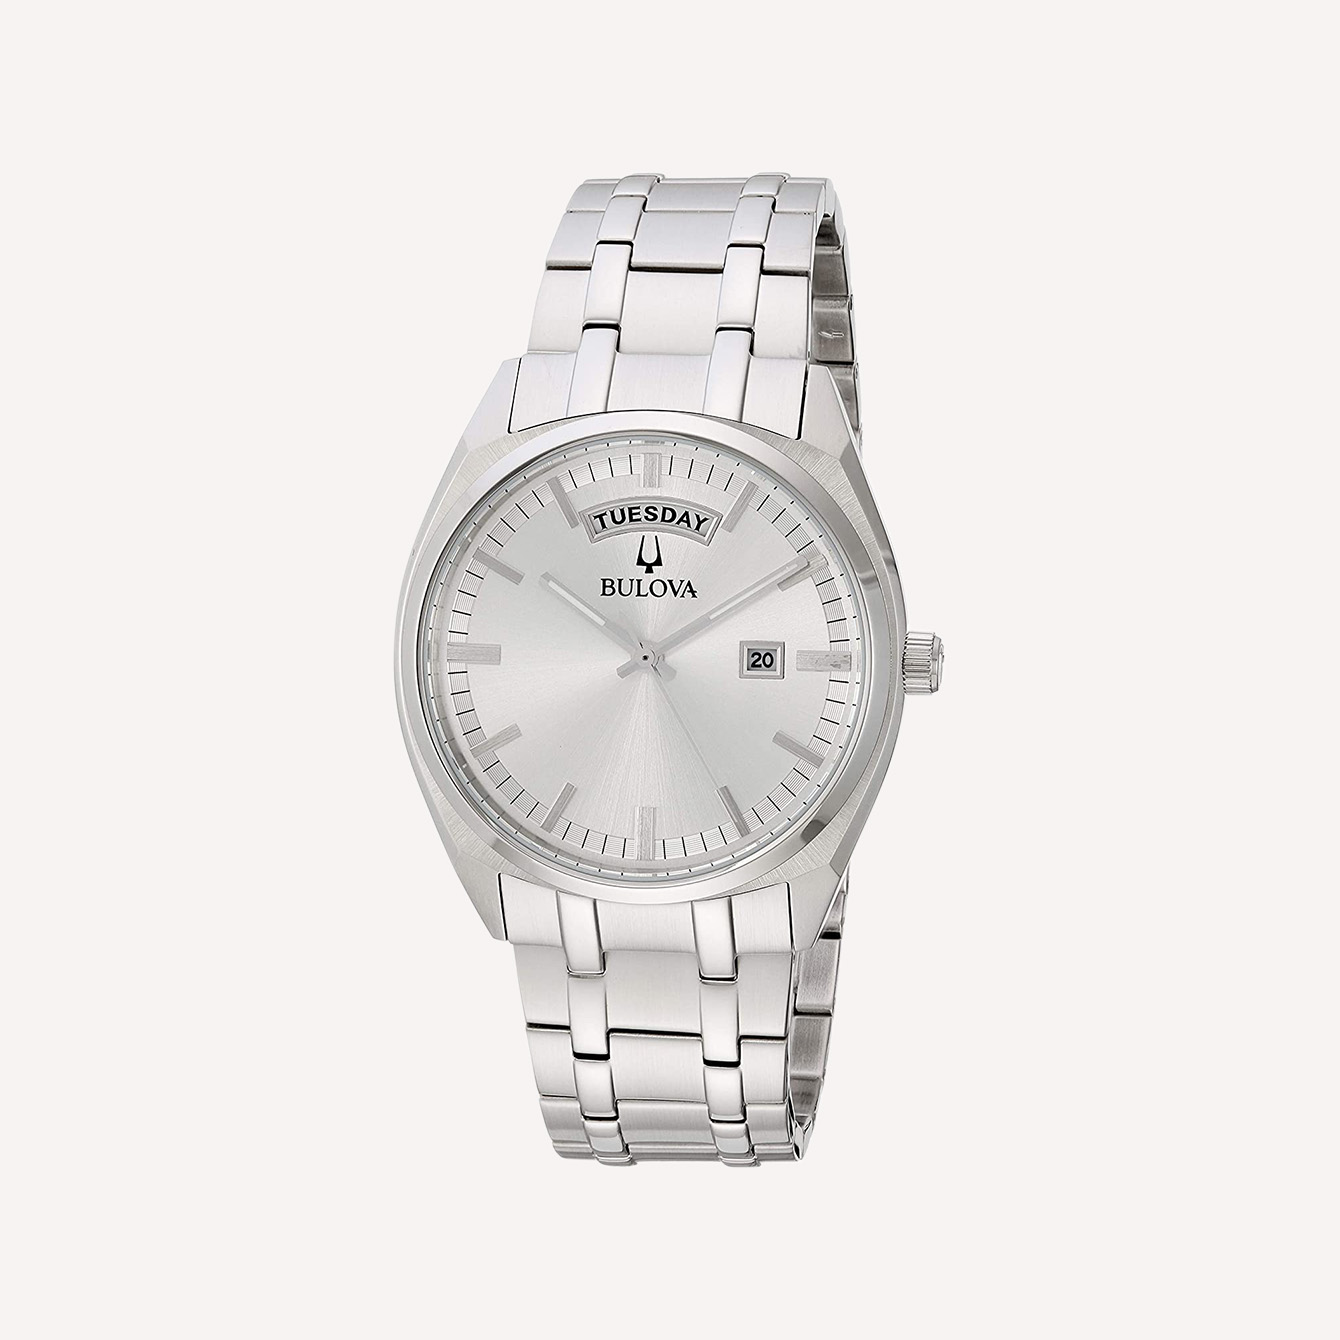 Bulova Dress Watch Model 96C127